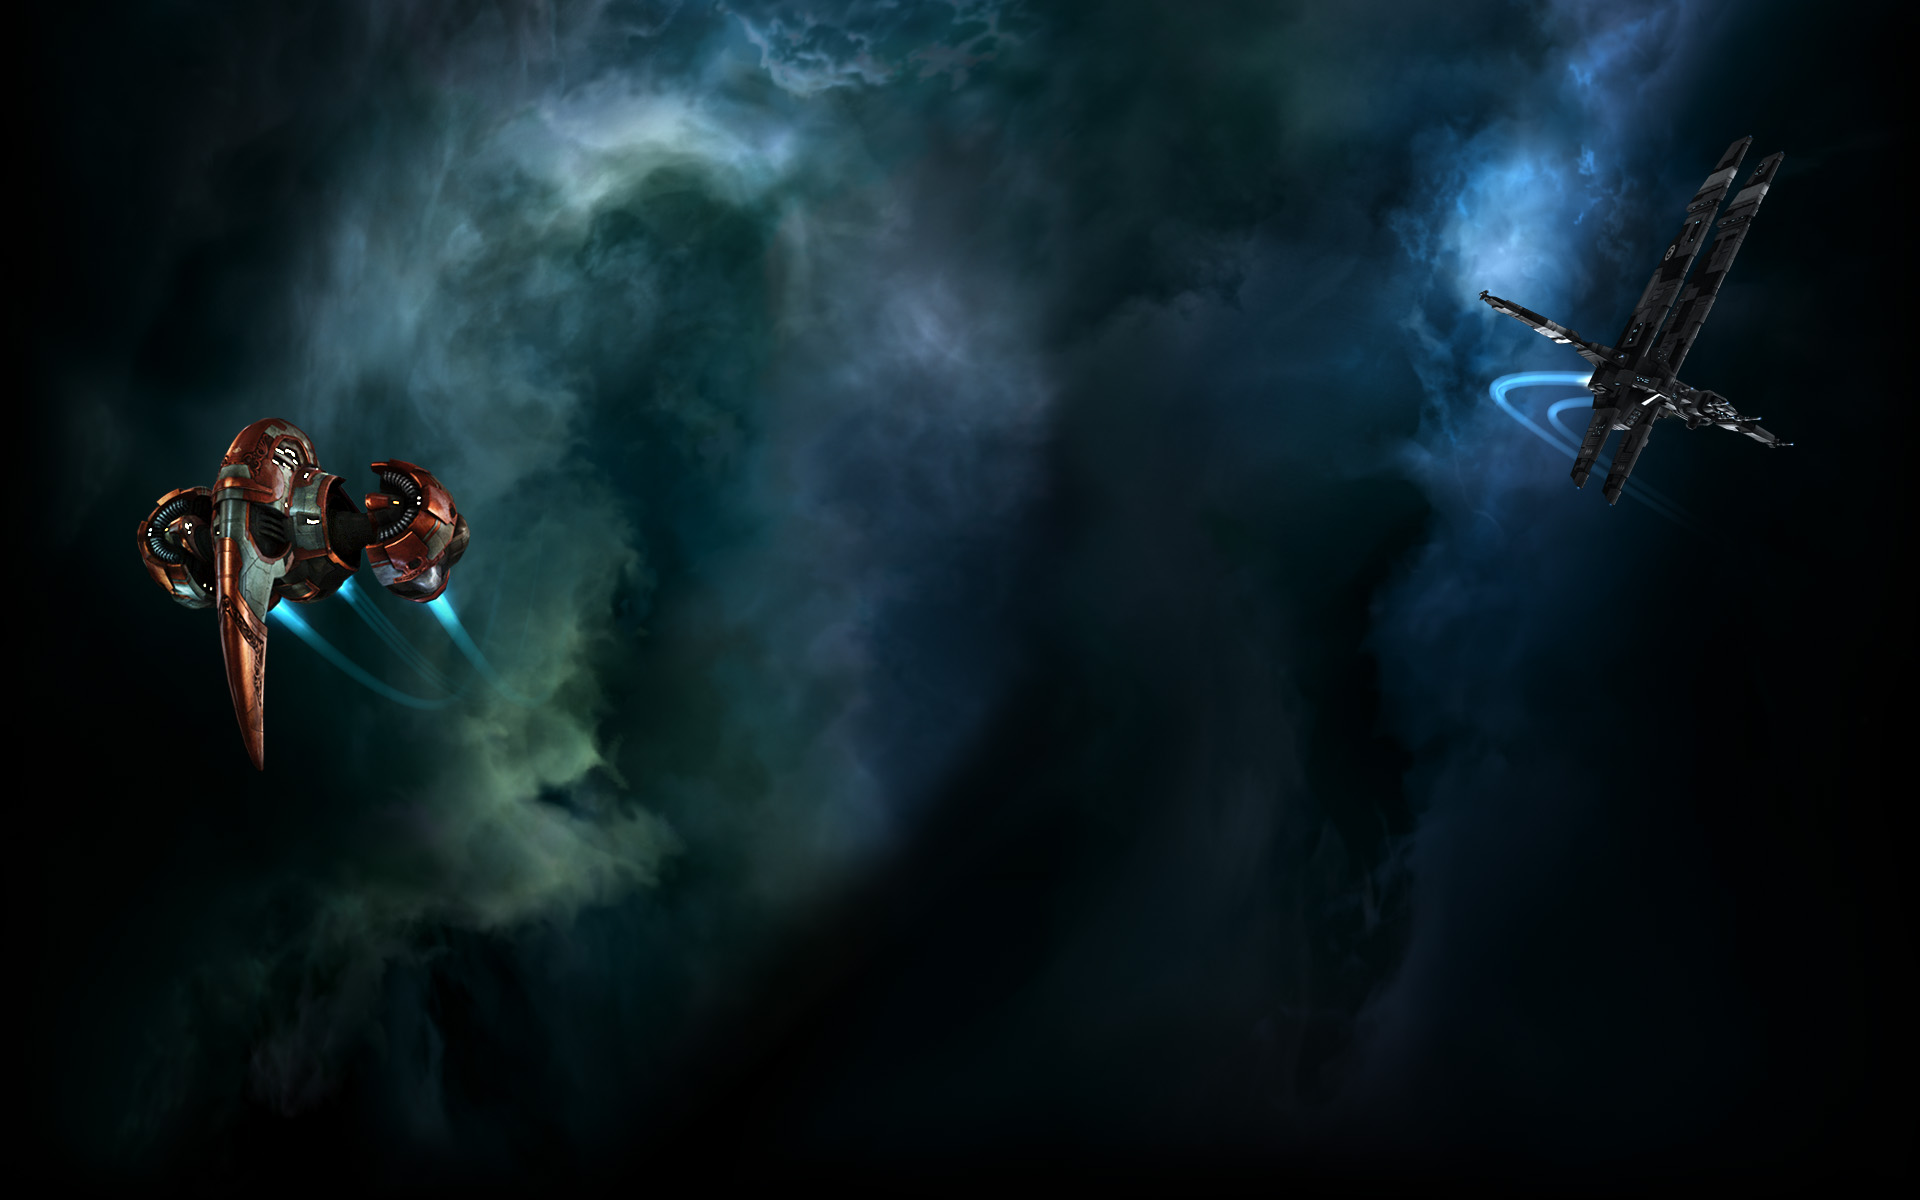 Eve online steam link